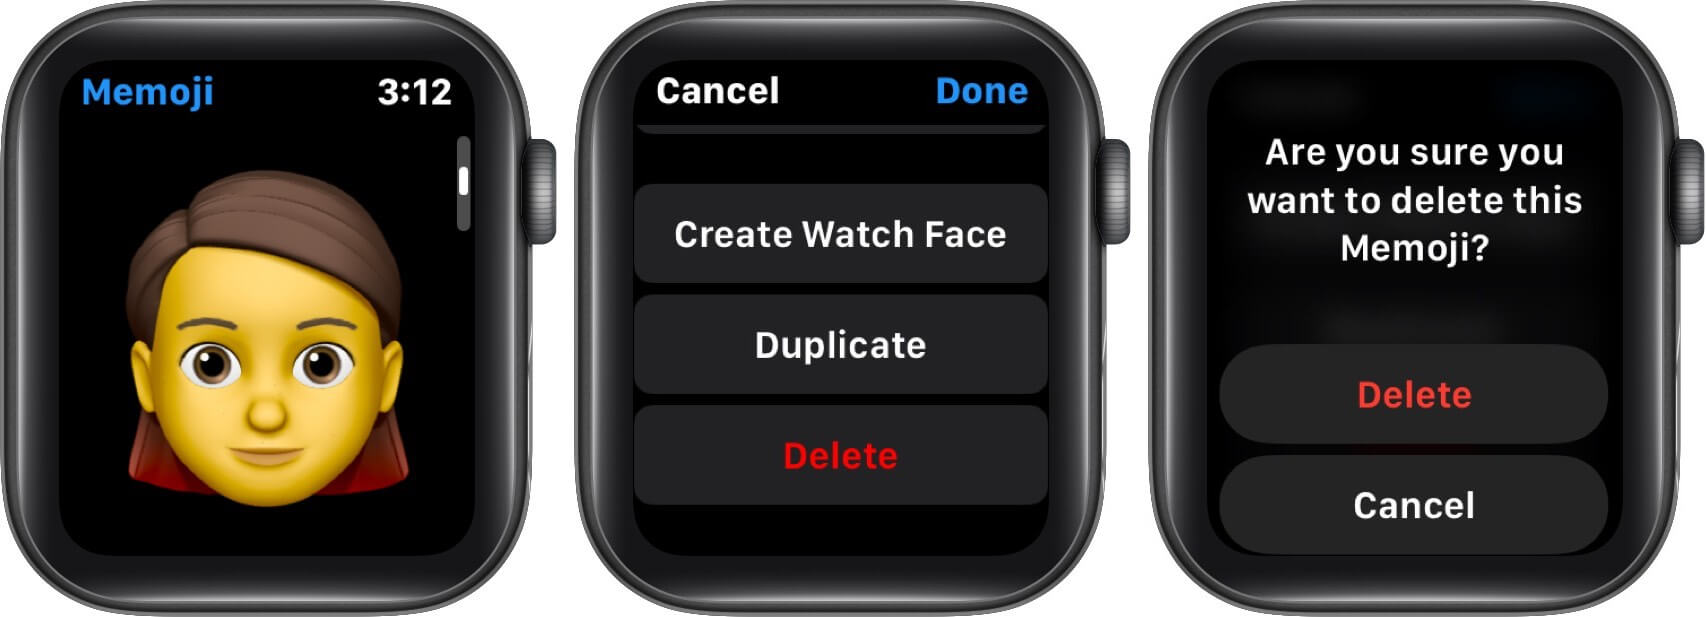 delete memoji on apple watch memoji app